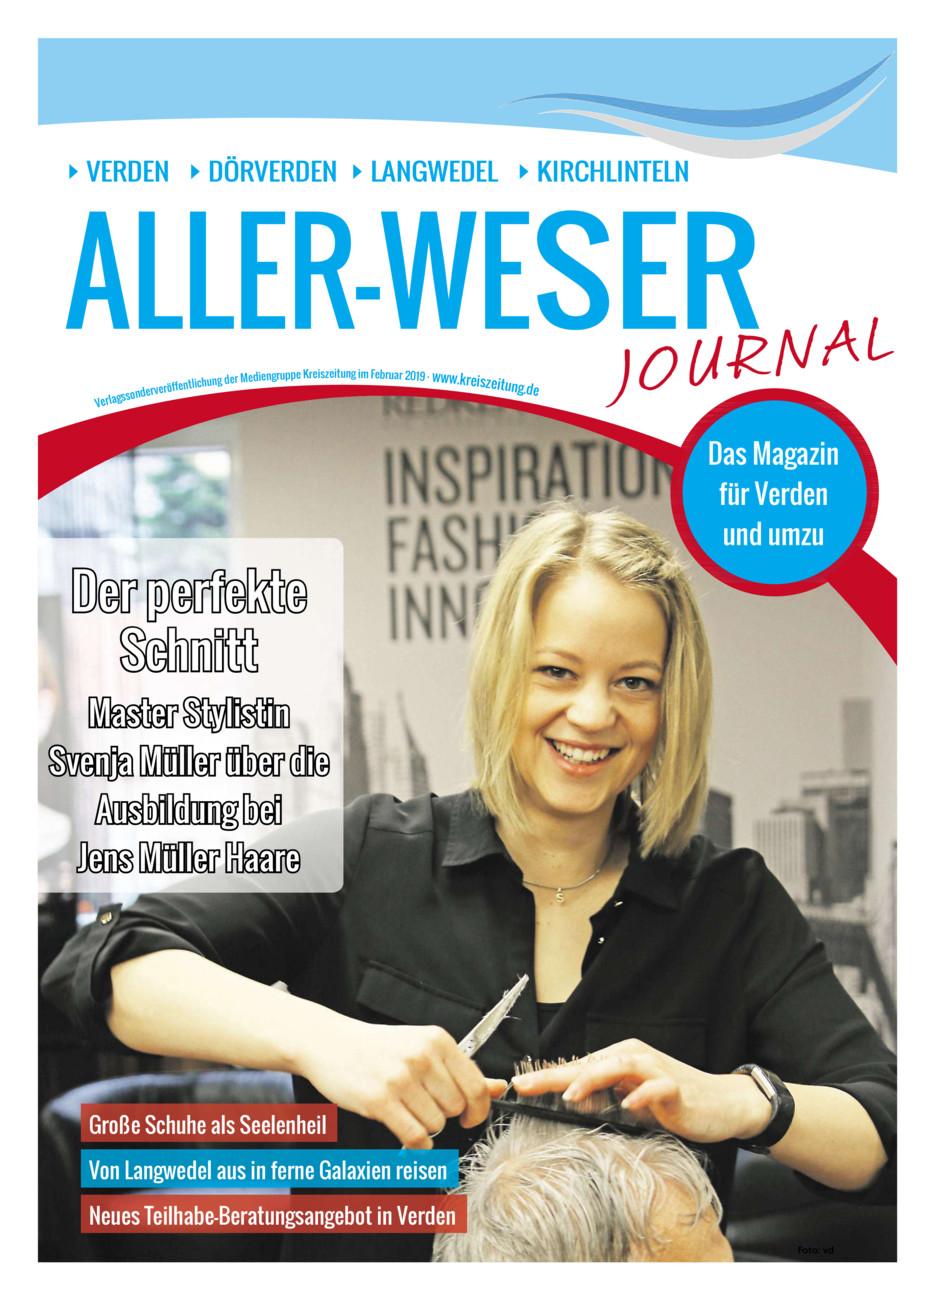 Aller-Weser-Journal vom Freitag, 22.02.2019